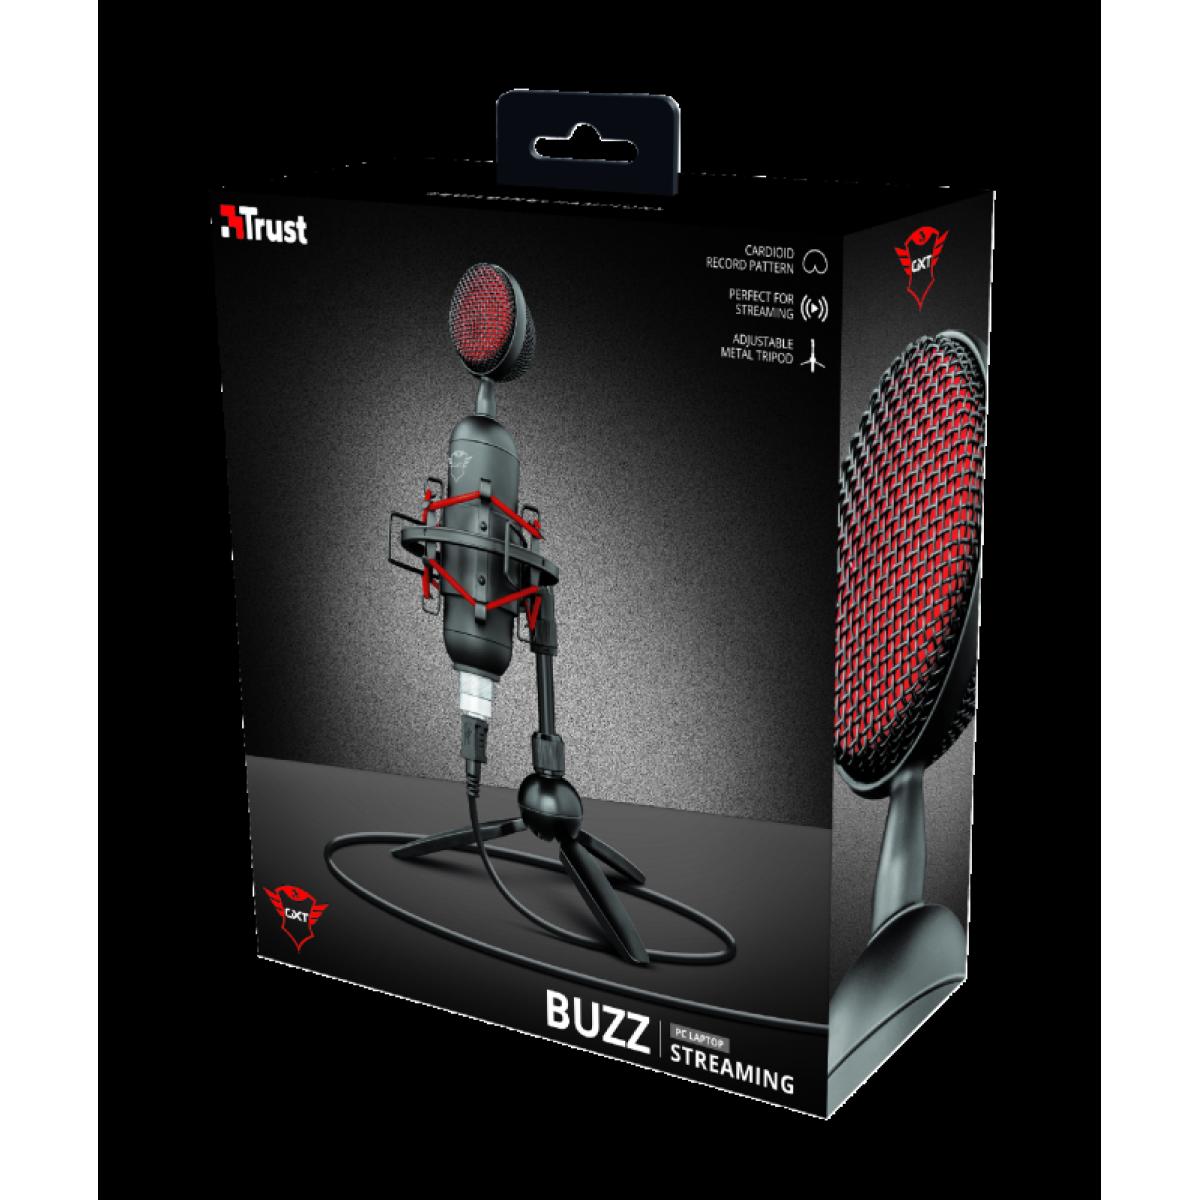 Microfone Gamer Trust, GXT 244 Buzz Streaming, USB, T23466